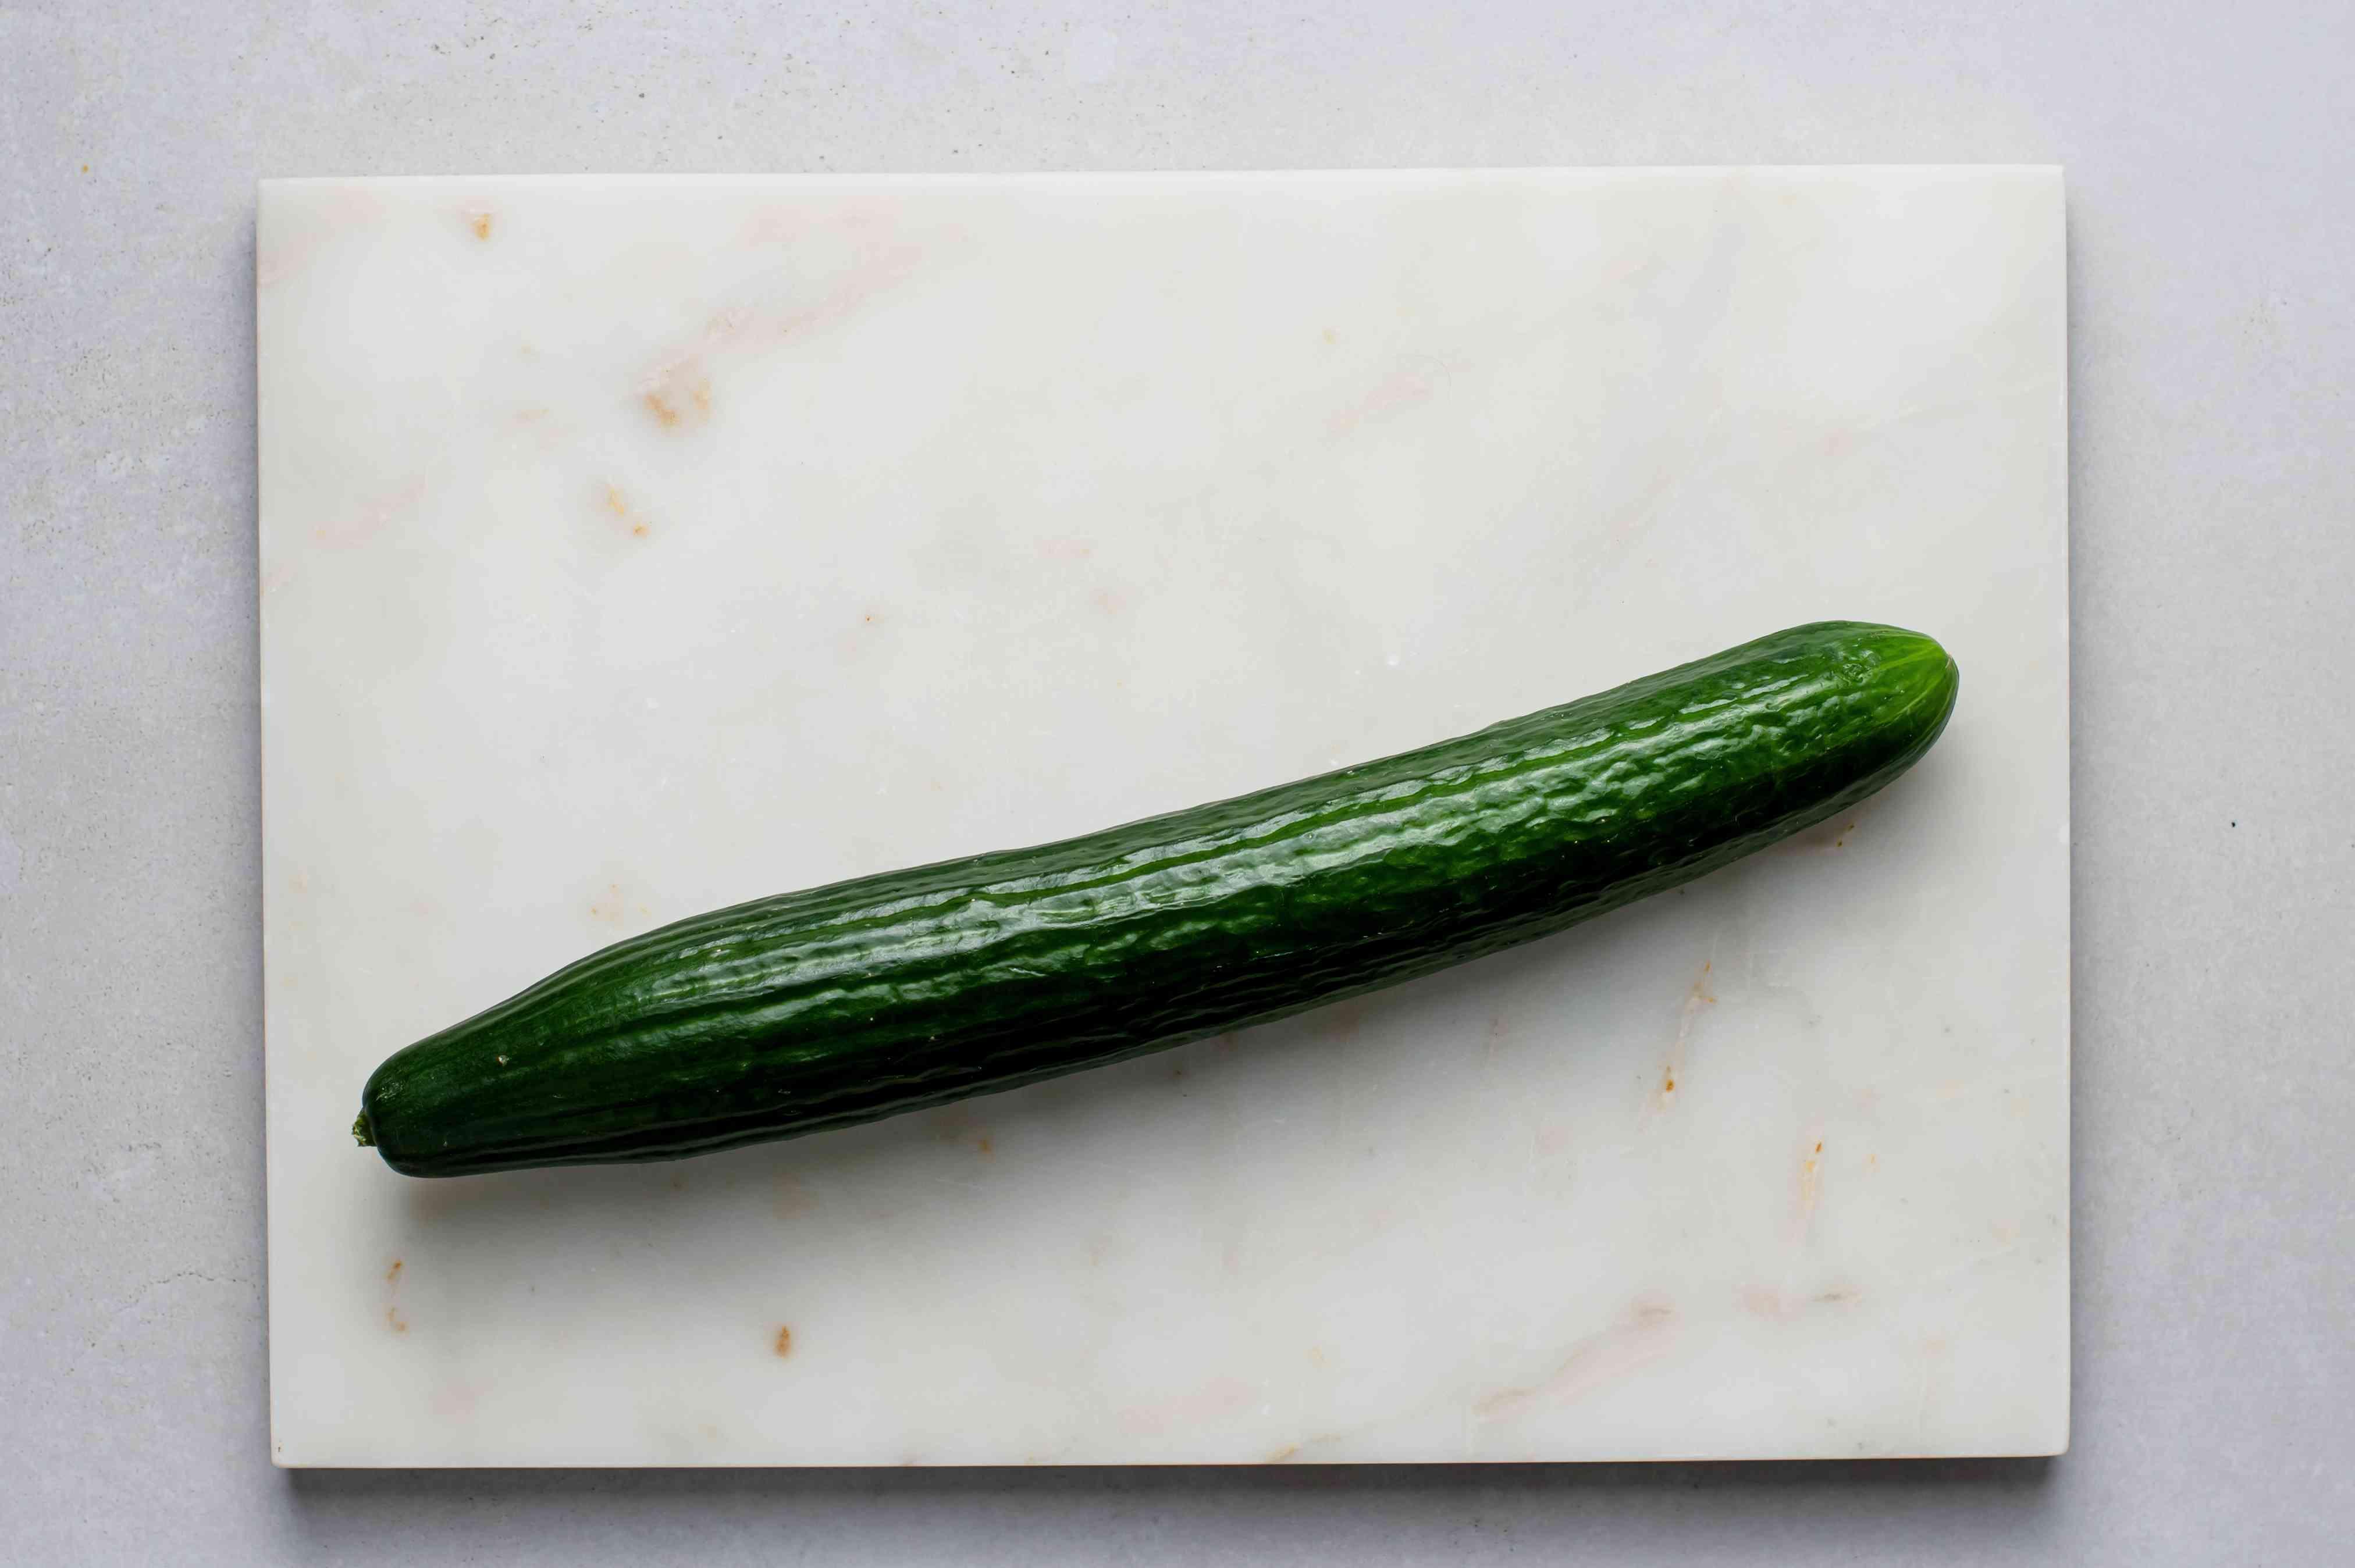 Cucumber on a cutting board